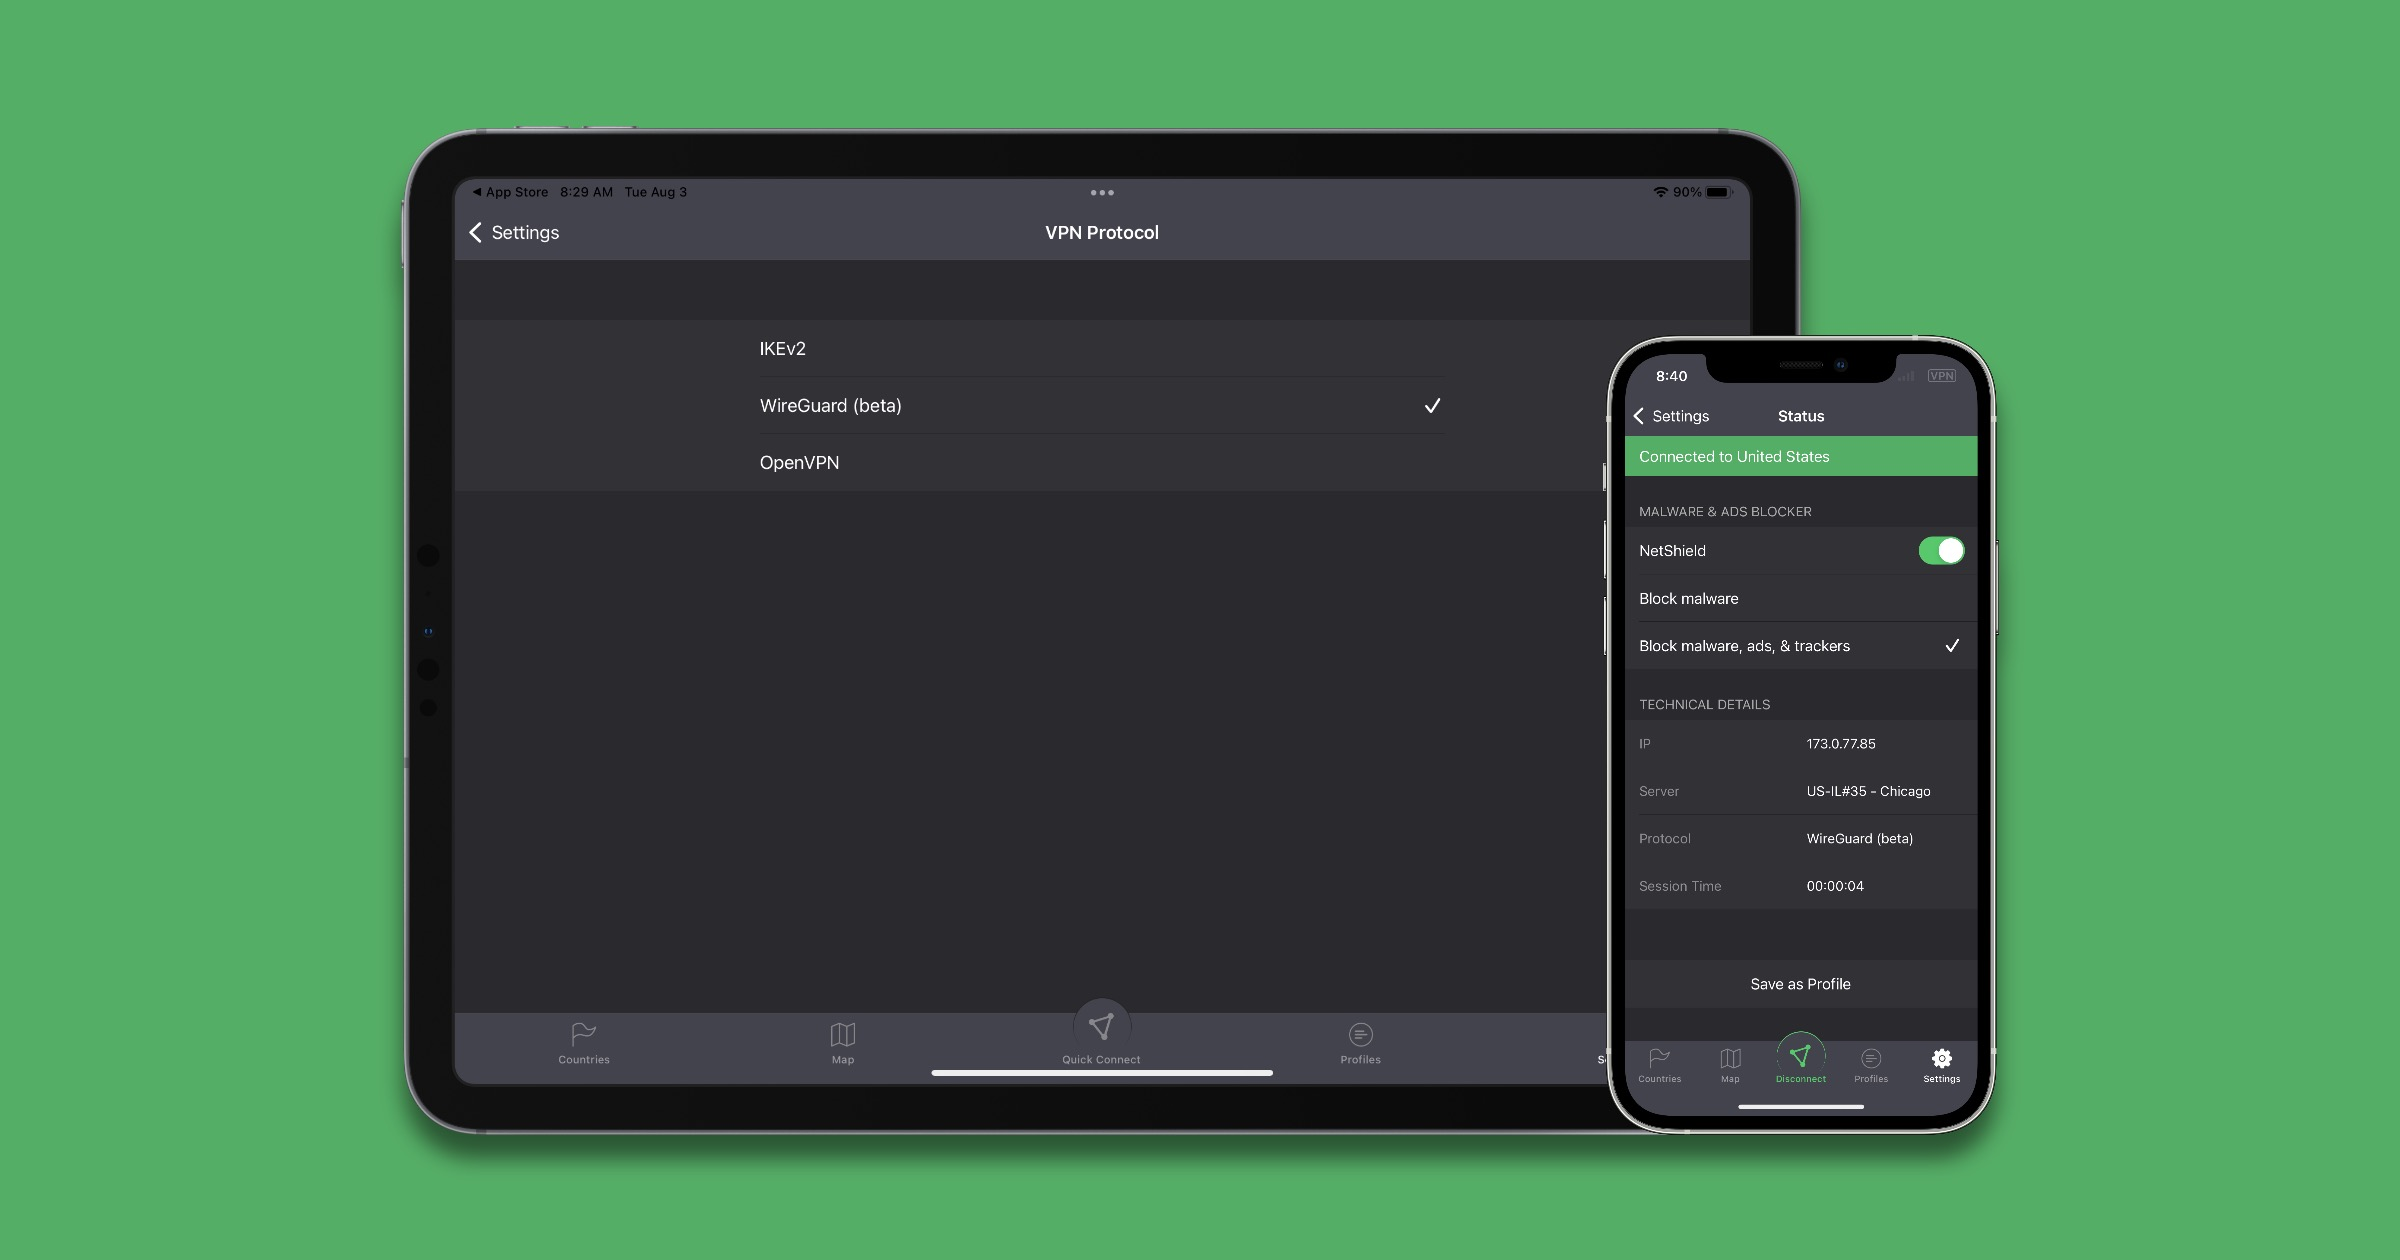 Update to ProtonVPN Adds WireGuard Protocol, iOS Kill Switch